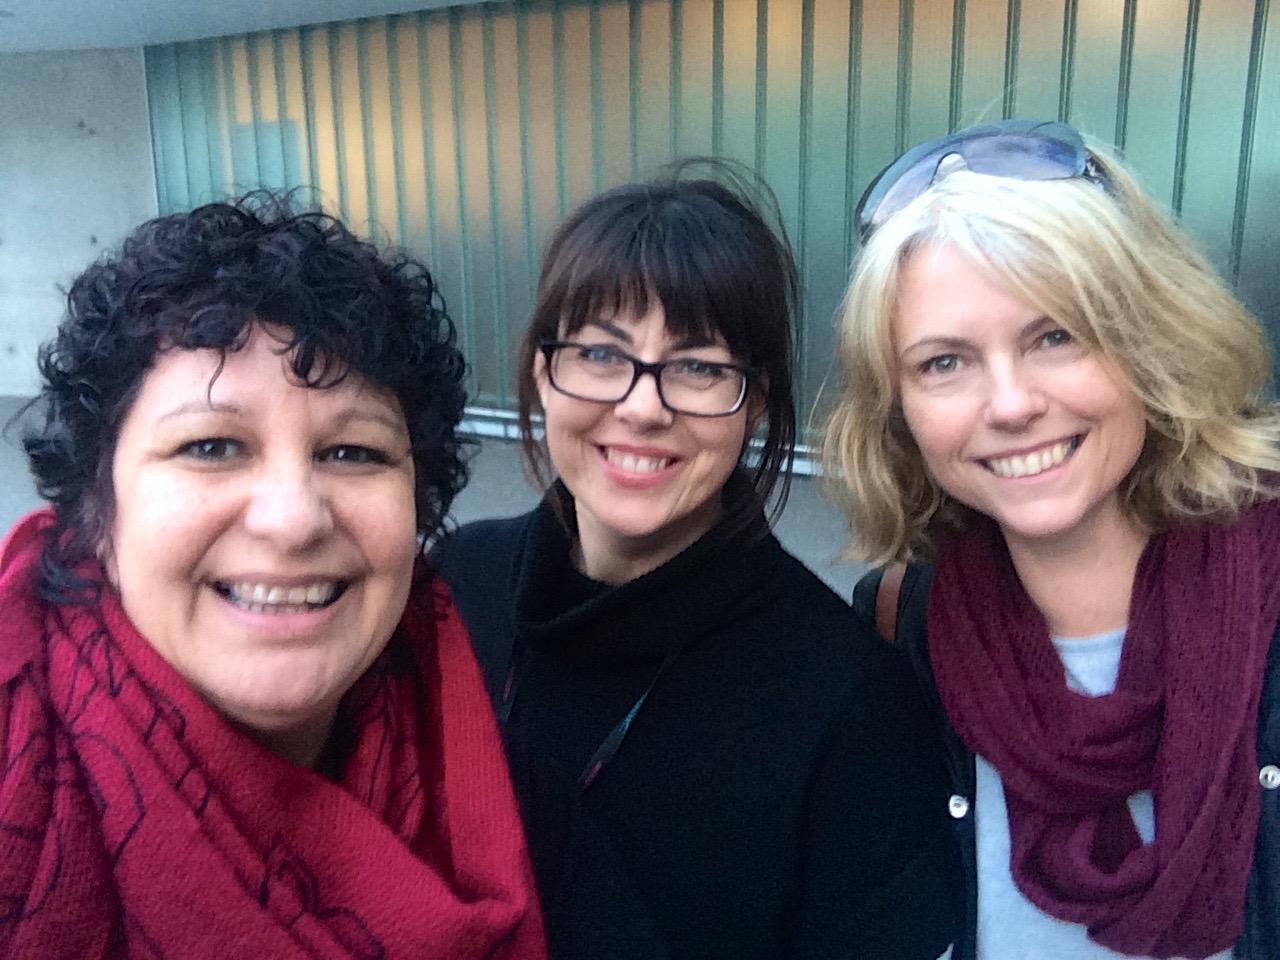 The research team: Me, Alison & Treena